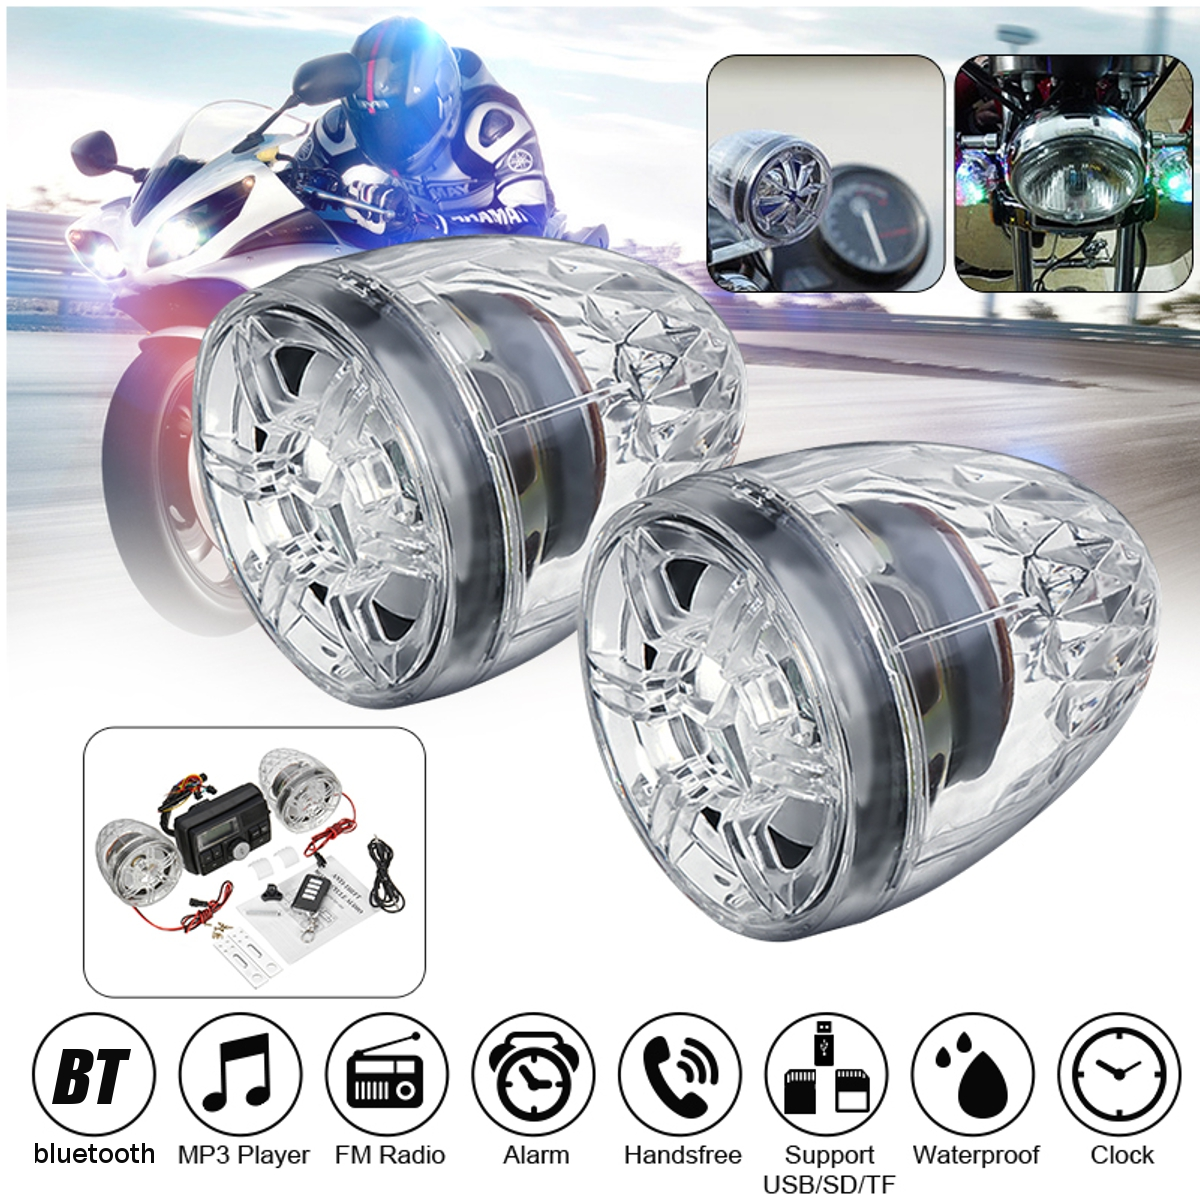 Handlebar Motor Car Audio Radio Stereo 2X Speakers Music Amplifier Anti-theft ATV Motorcycle Alarm Sound System MP3 Player